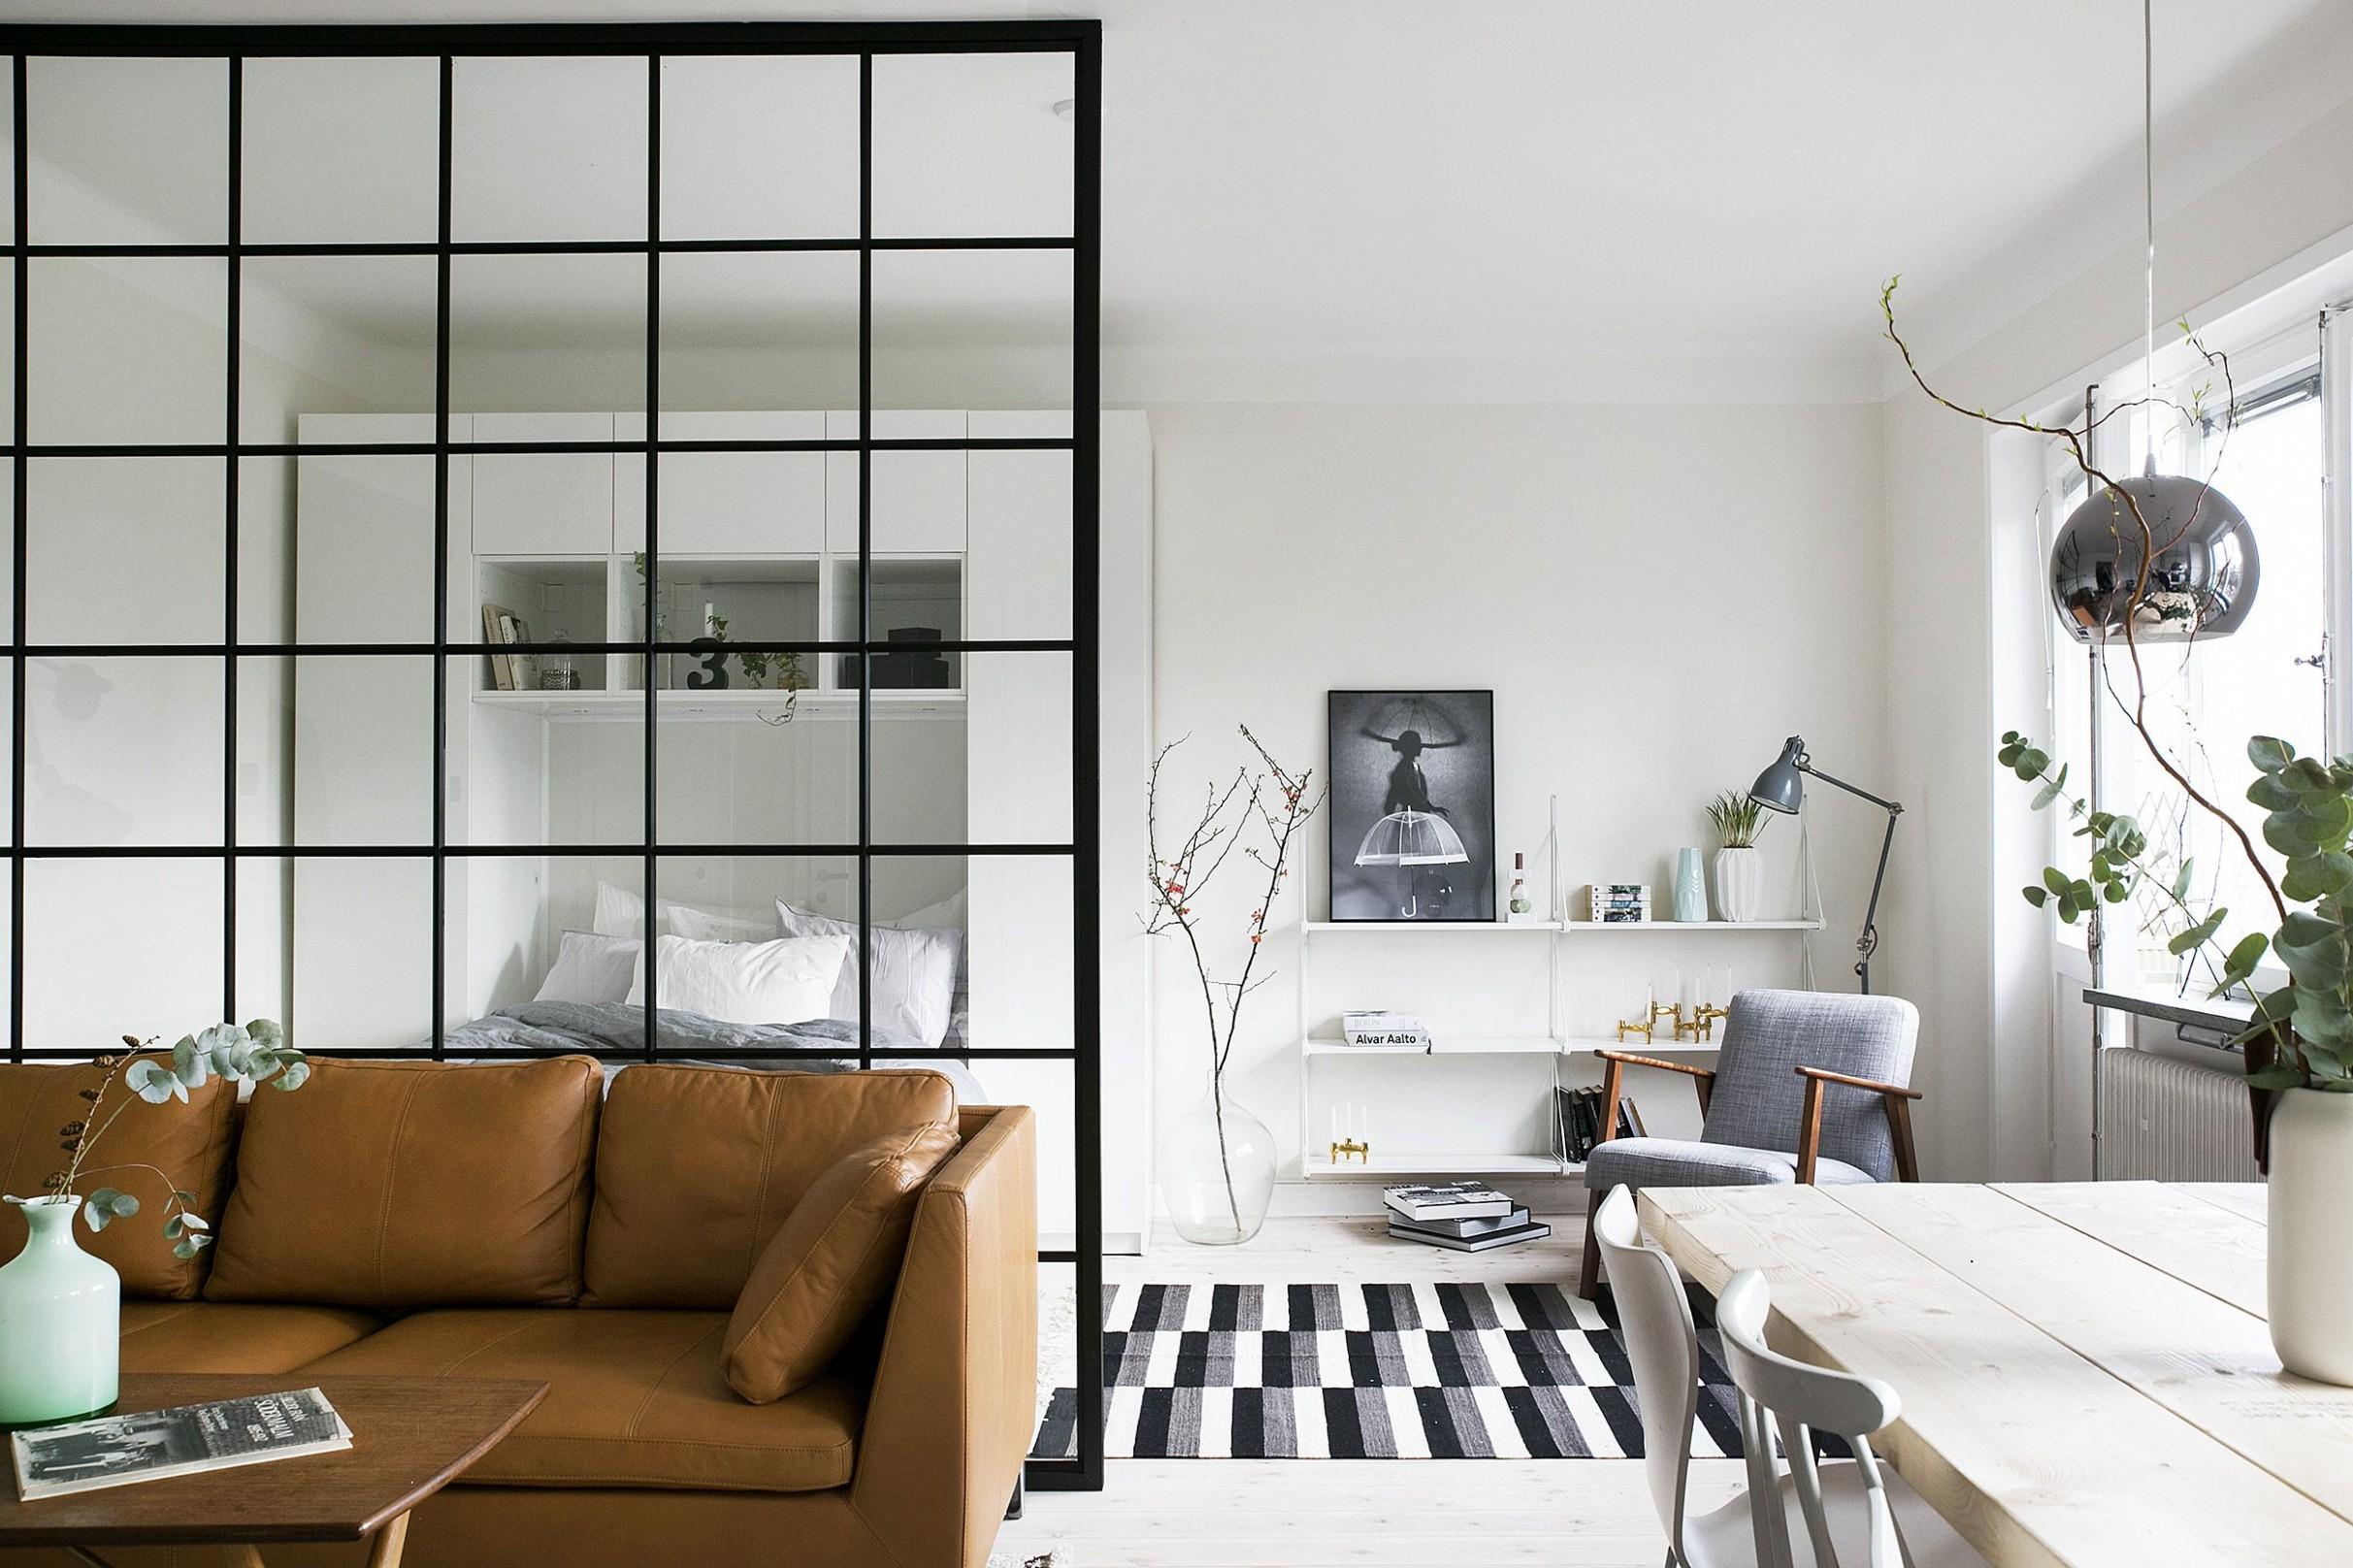 How to Decorate a Studio Apartment - 12 Studio Apartment Ideas - Apartment Decorating Layout Ideas